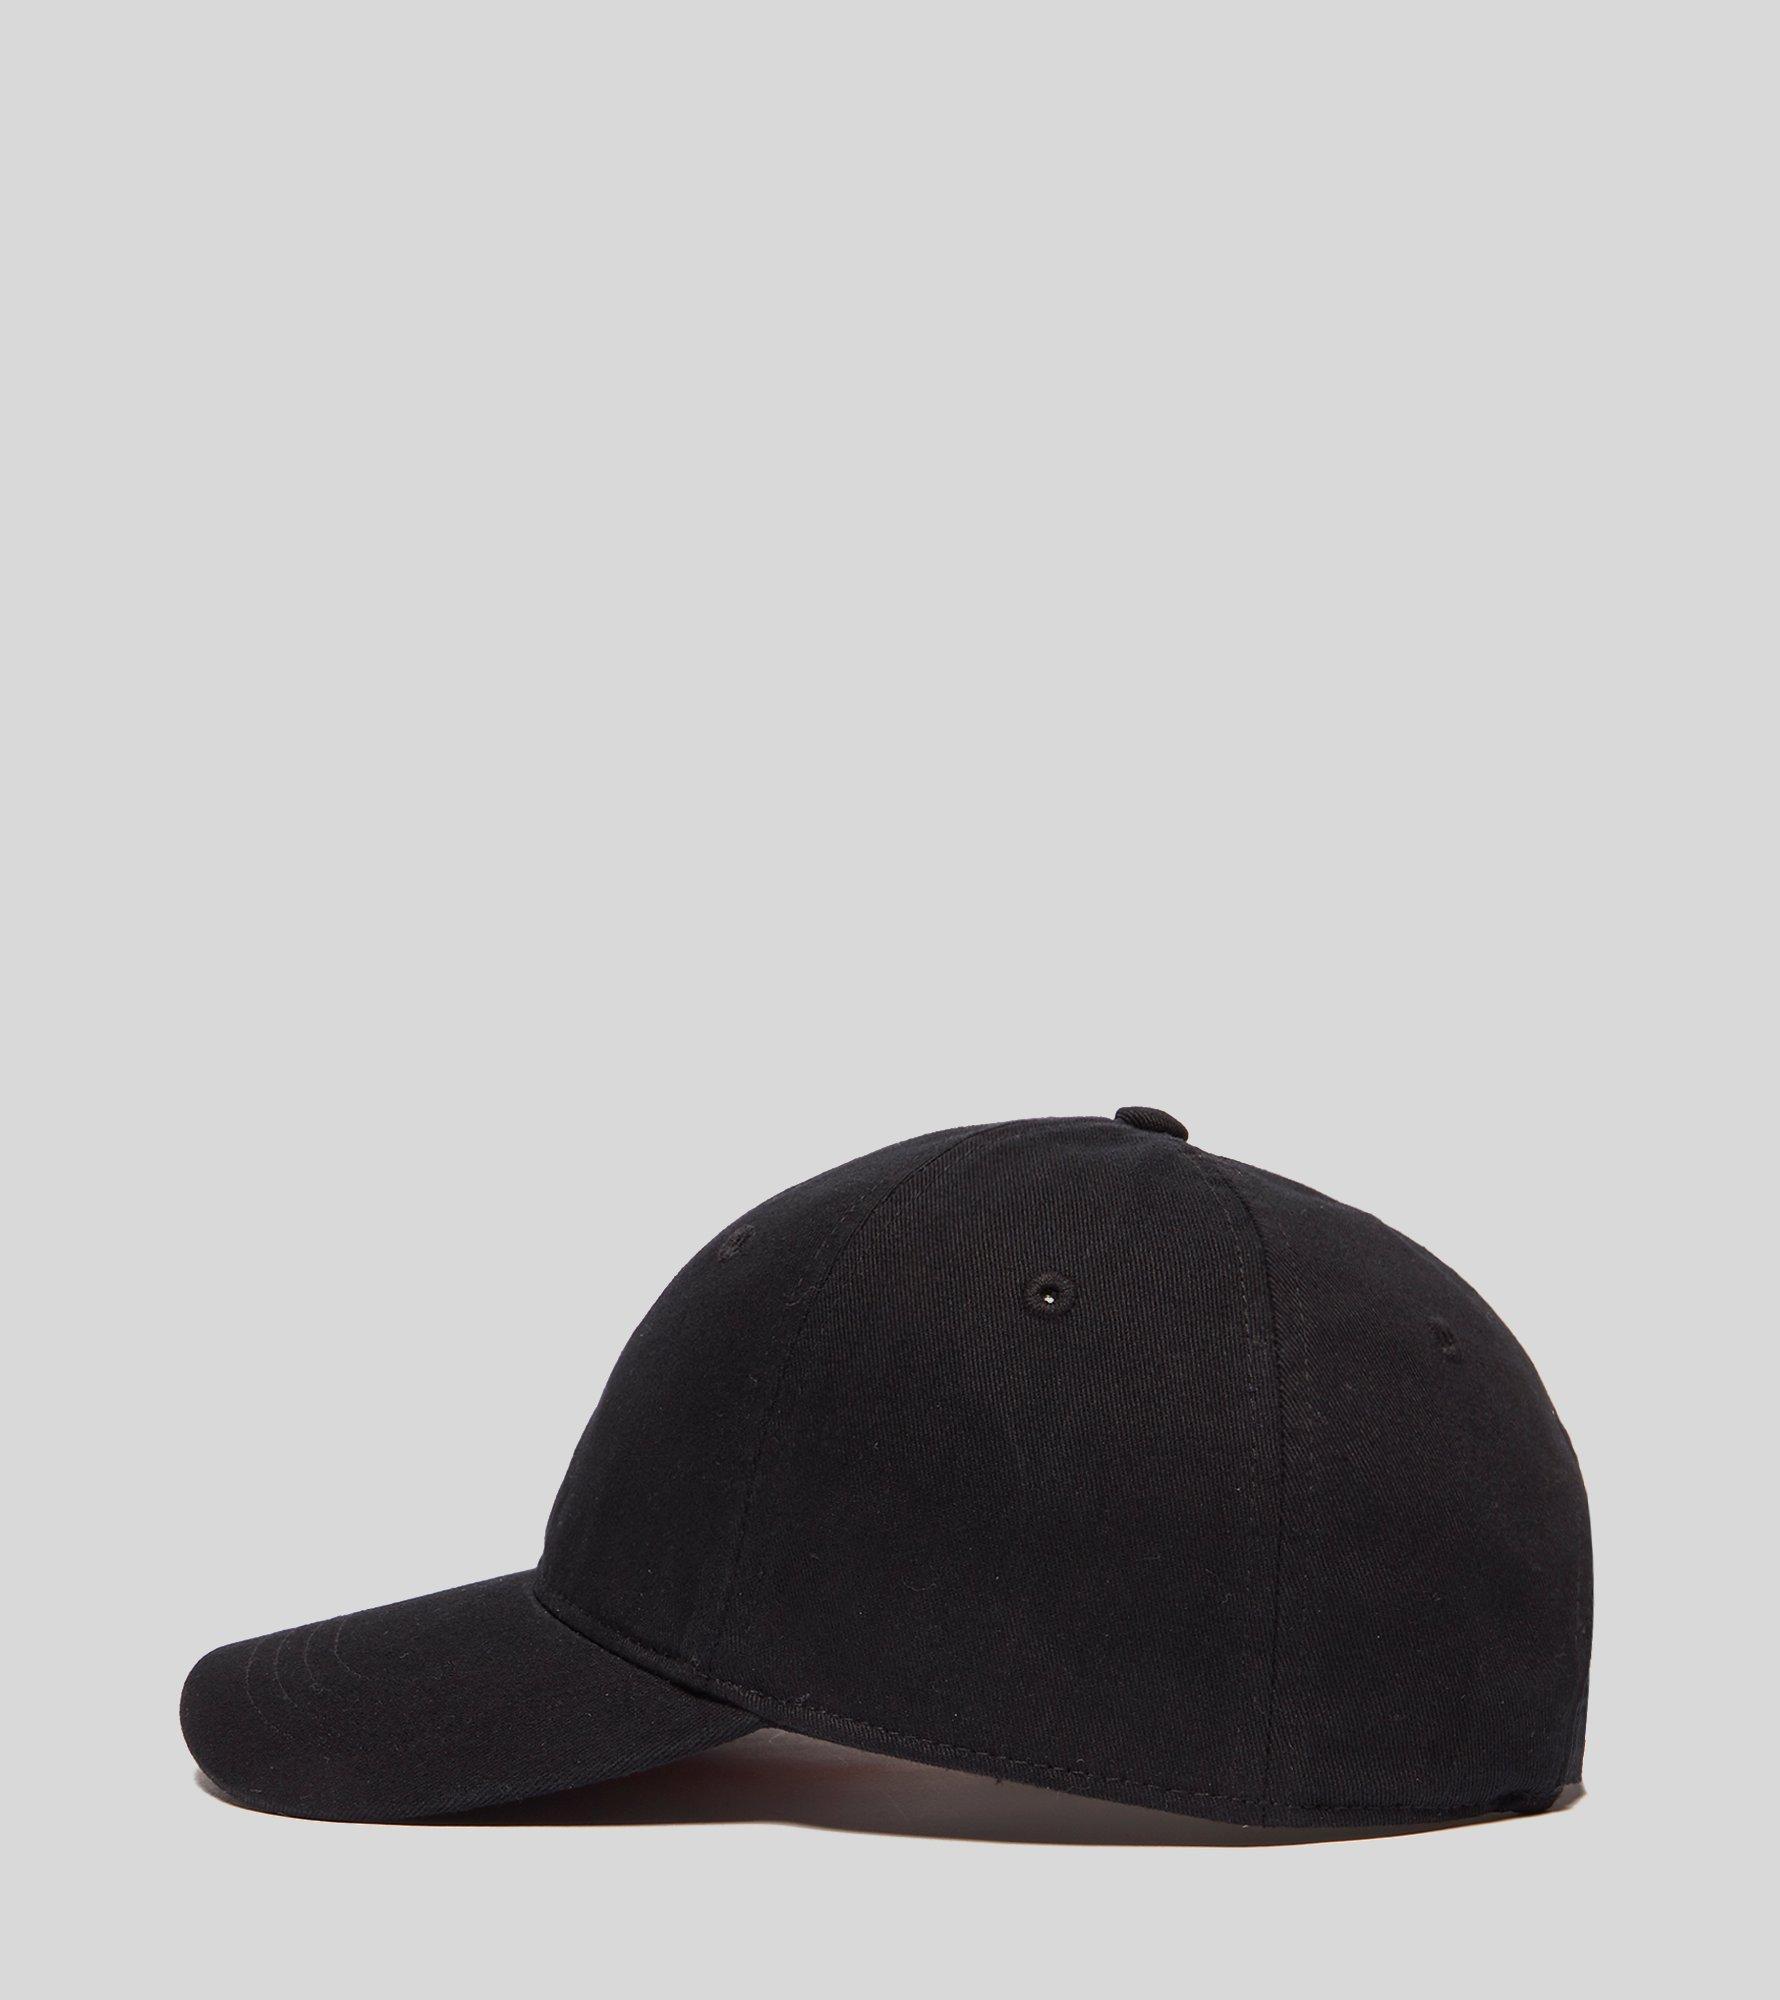 2a9e68f2fd2 Lyst - Carhartt WIP Madison Cap in Black for Men